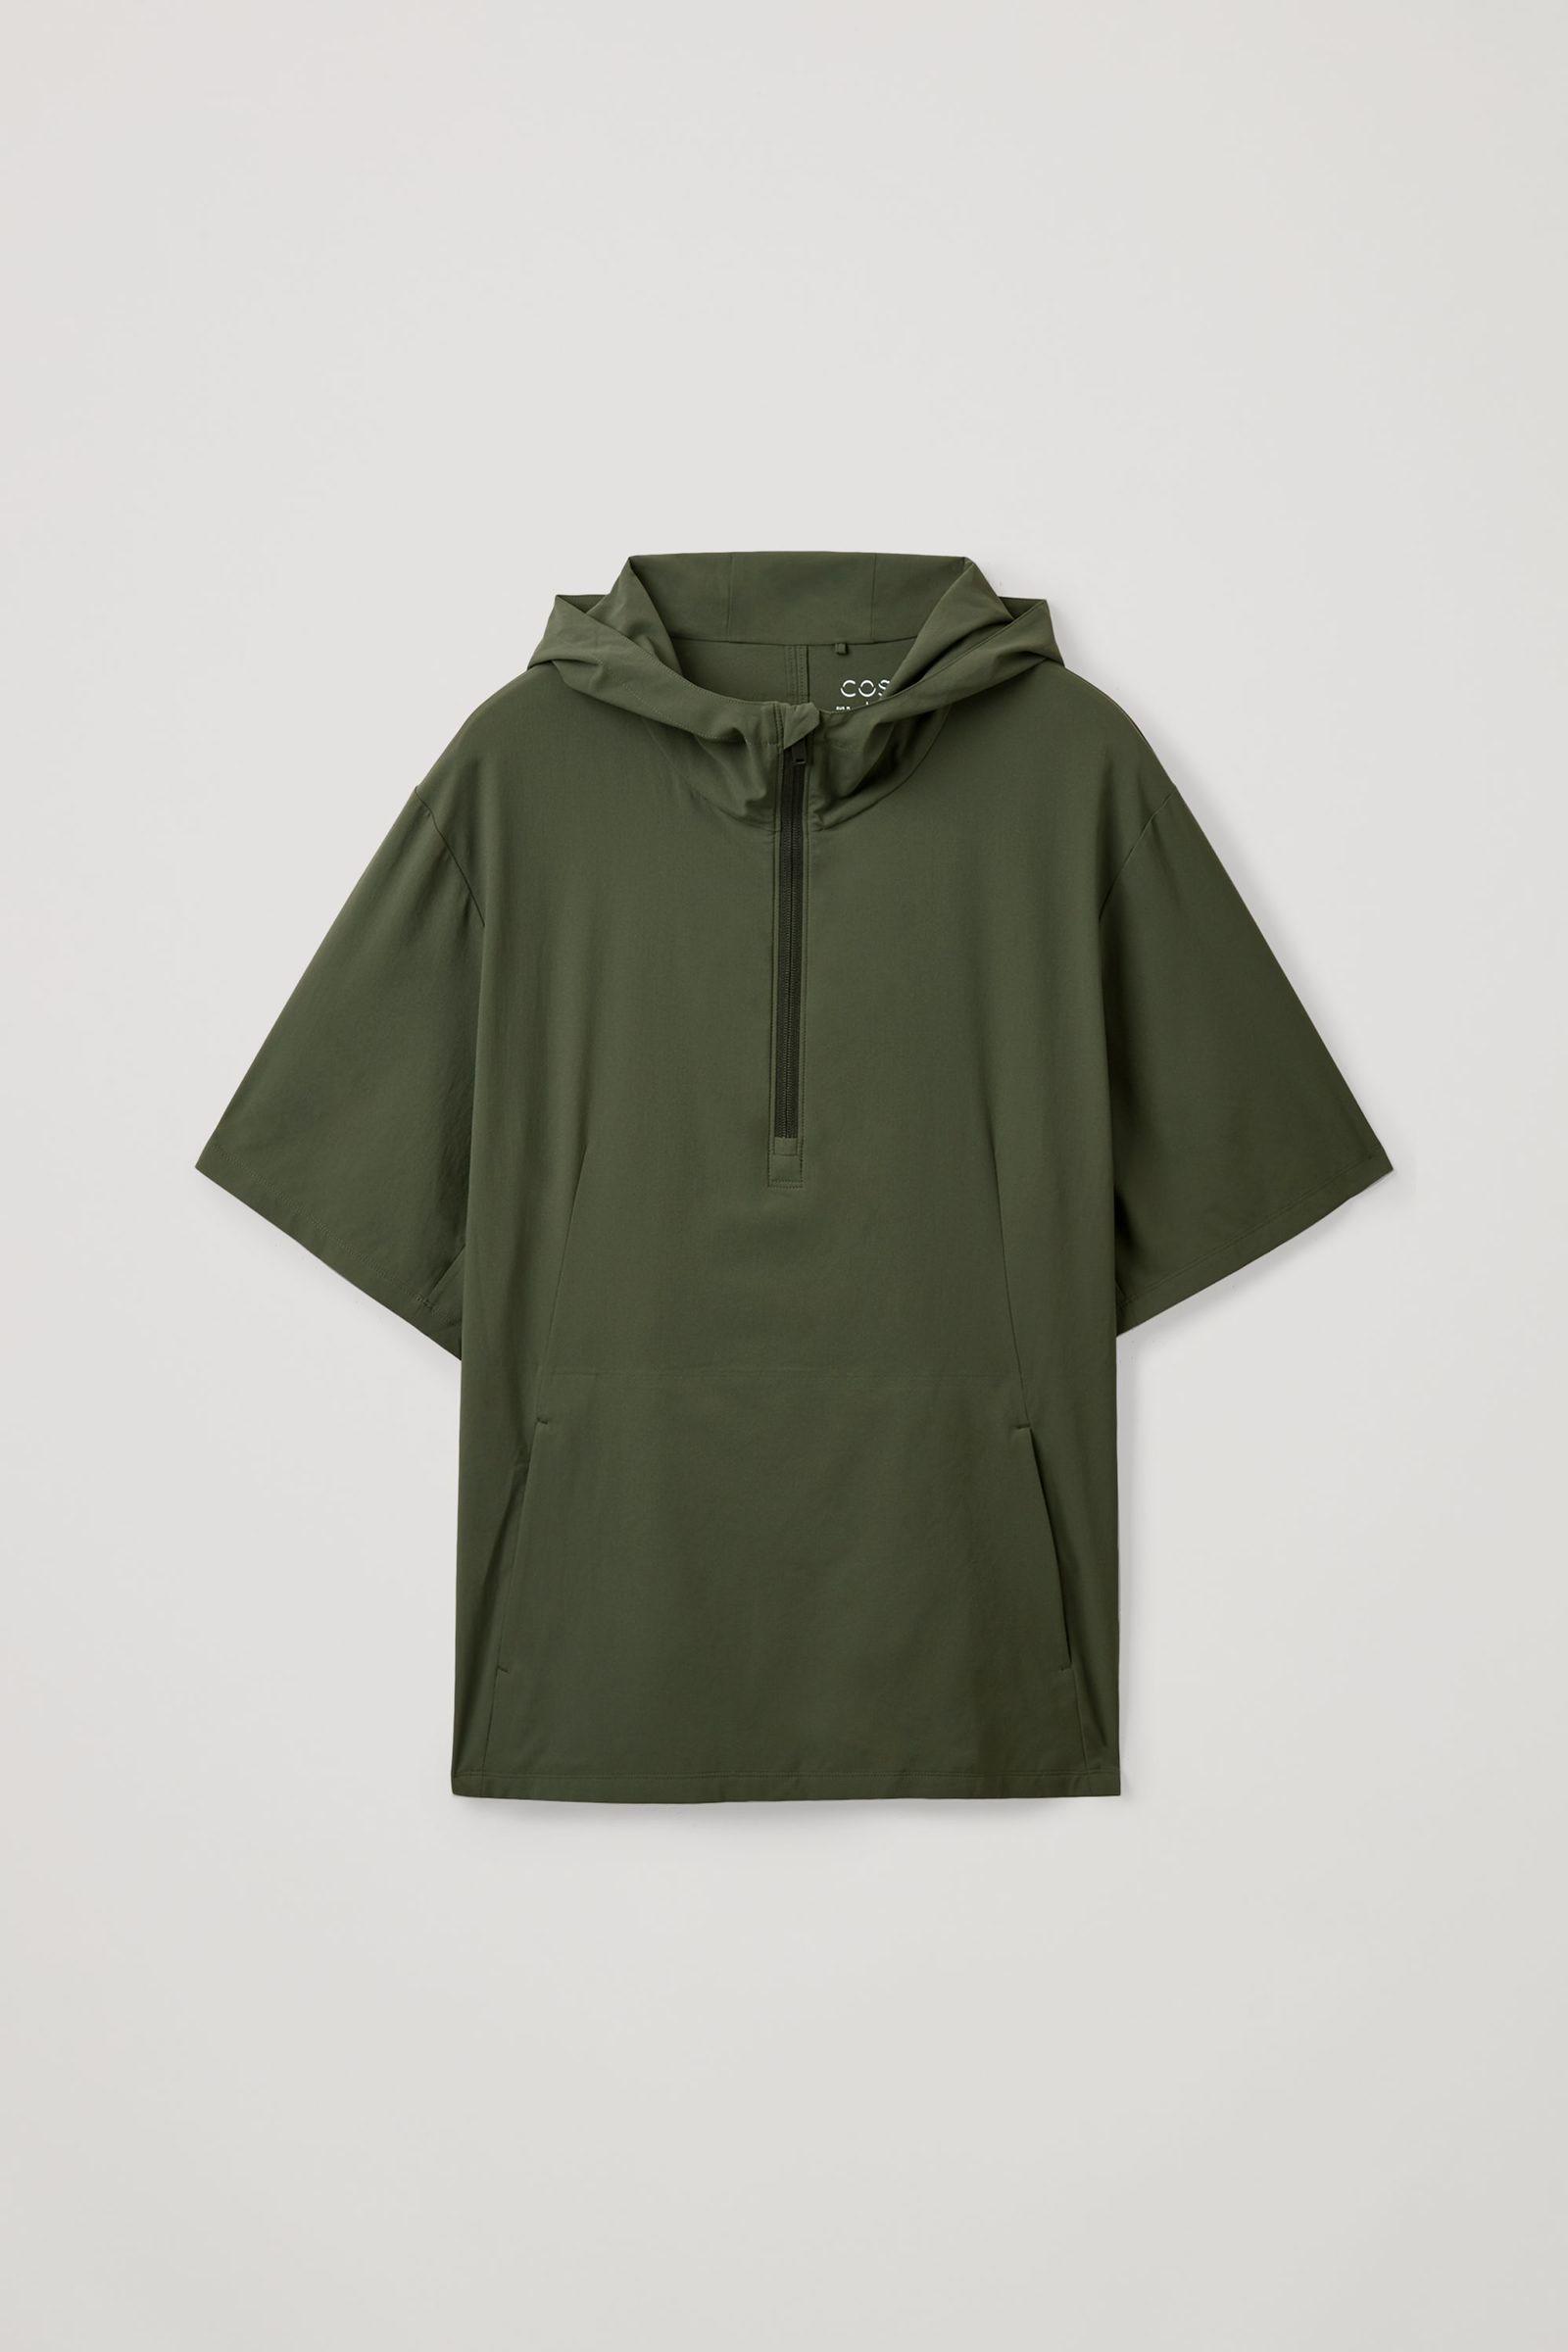 COS 리사이클드 폴리에스터 풀오버 재킷의 그린컬러 Product입니다.